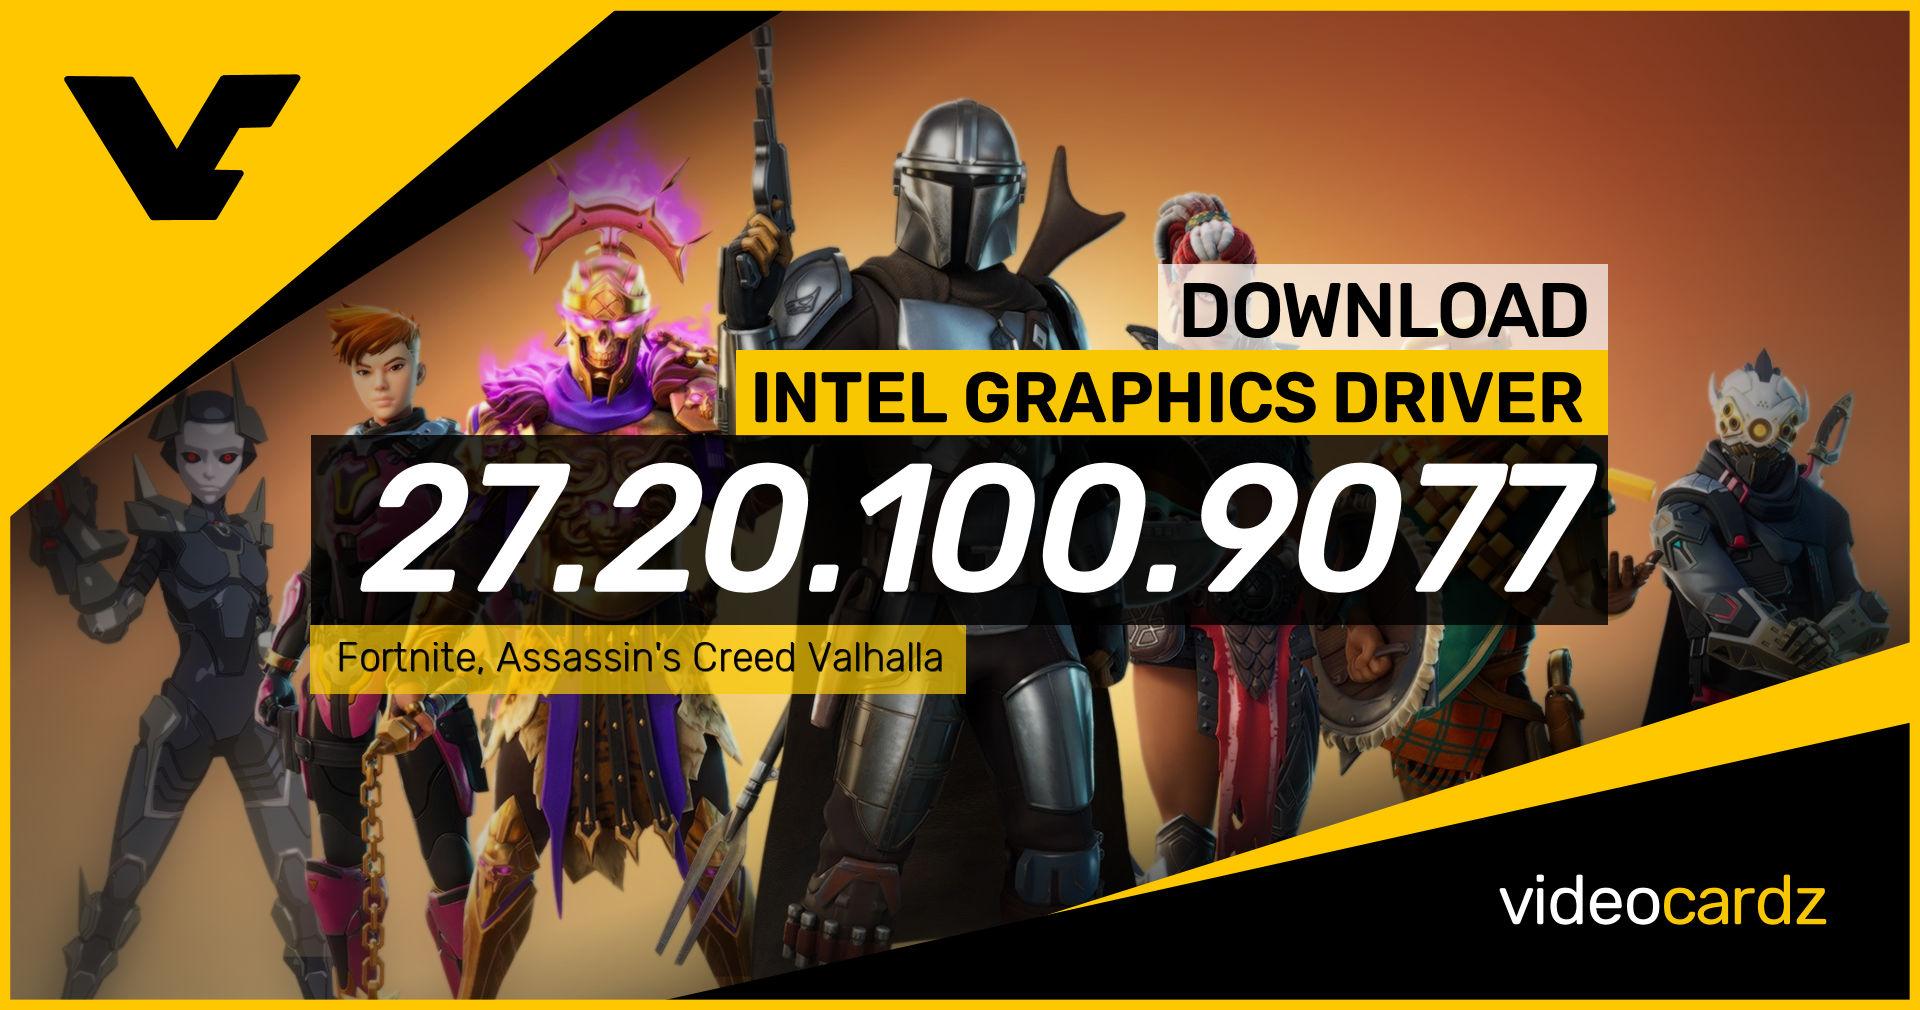 INTEL Graphics Driver 27.20.100.9077 – VideoCardz.com